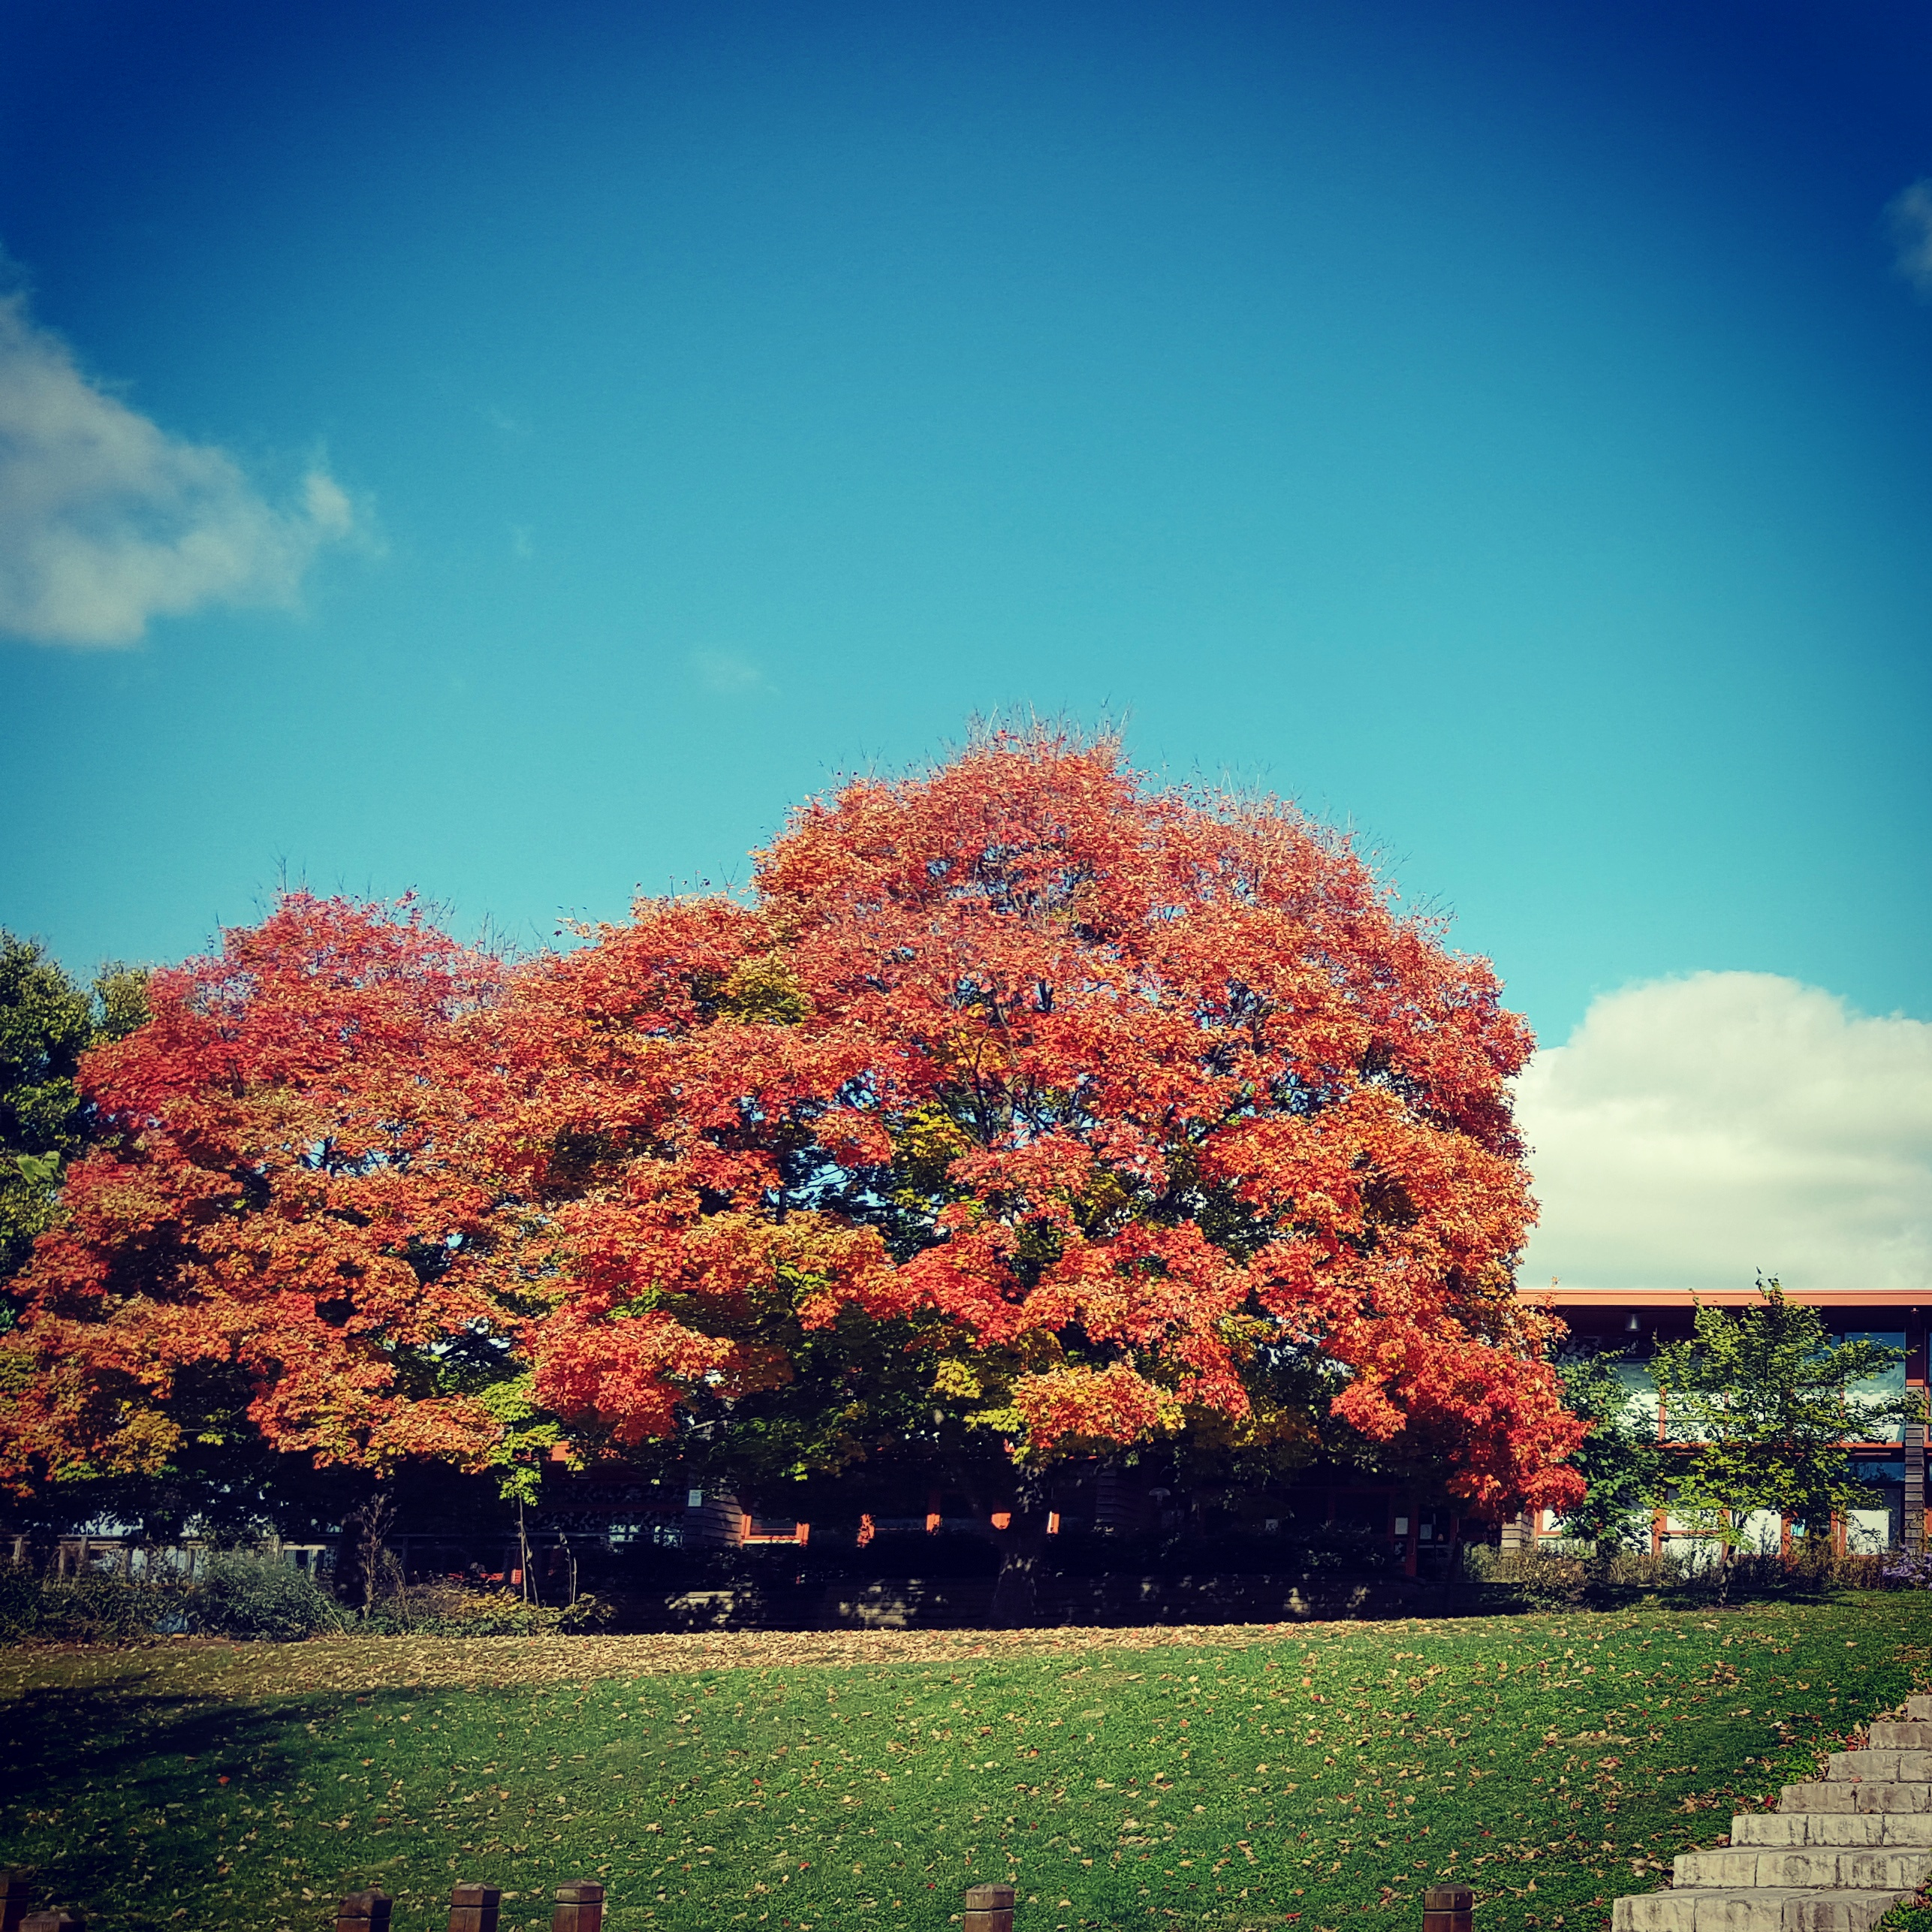 Oh, glorious autumn!